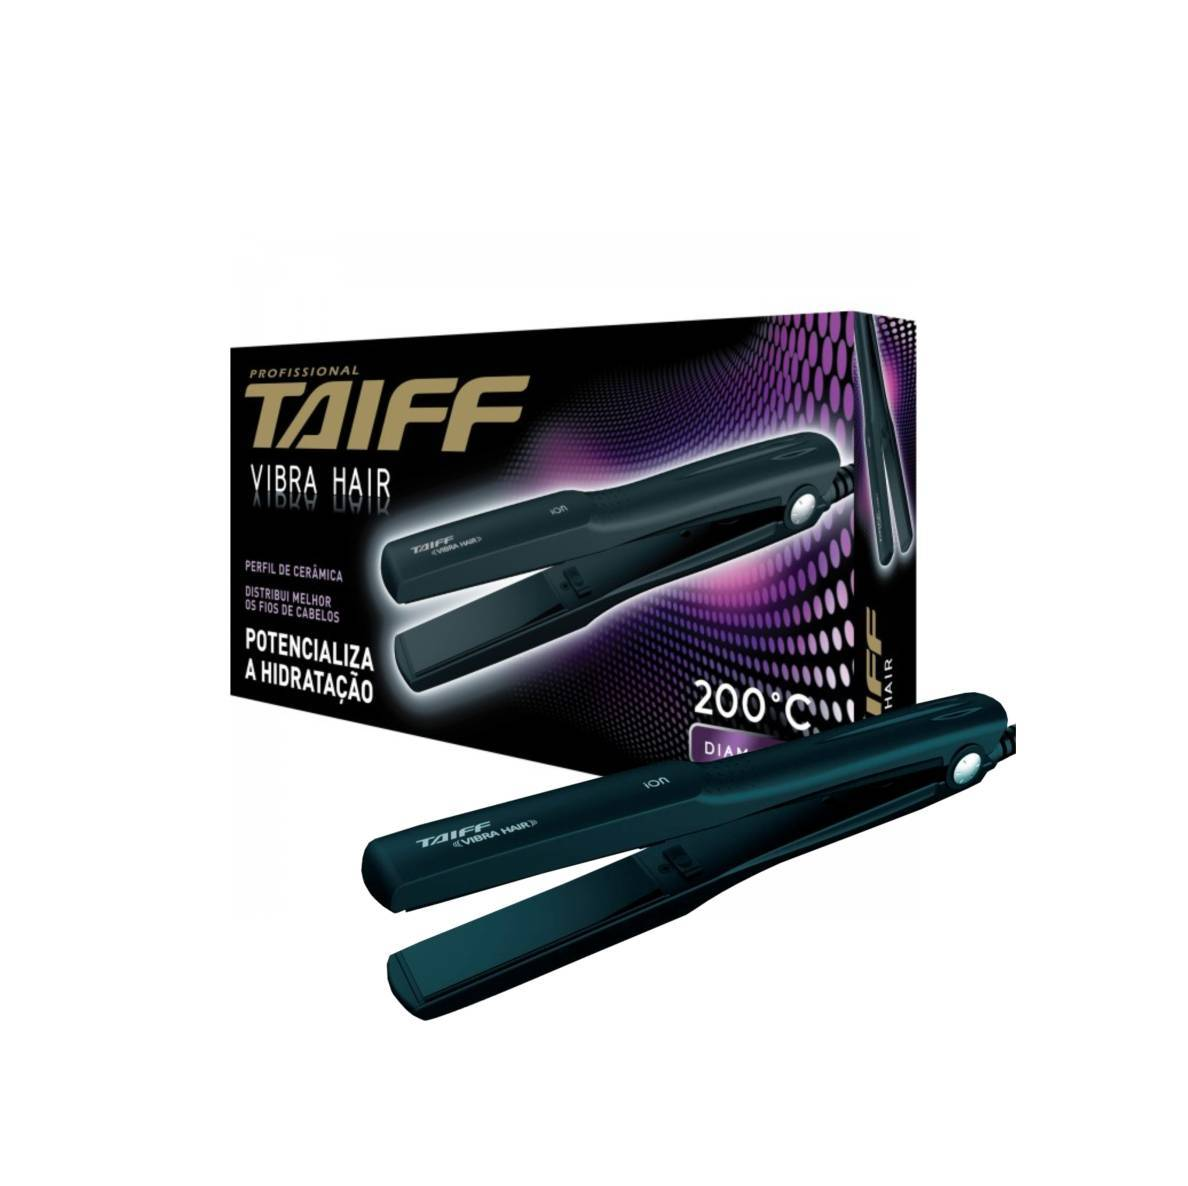 Chapa/Prancha Taiff Vibra Hair - Bivolt